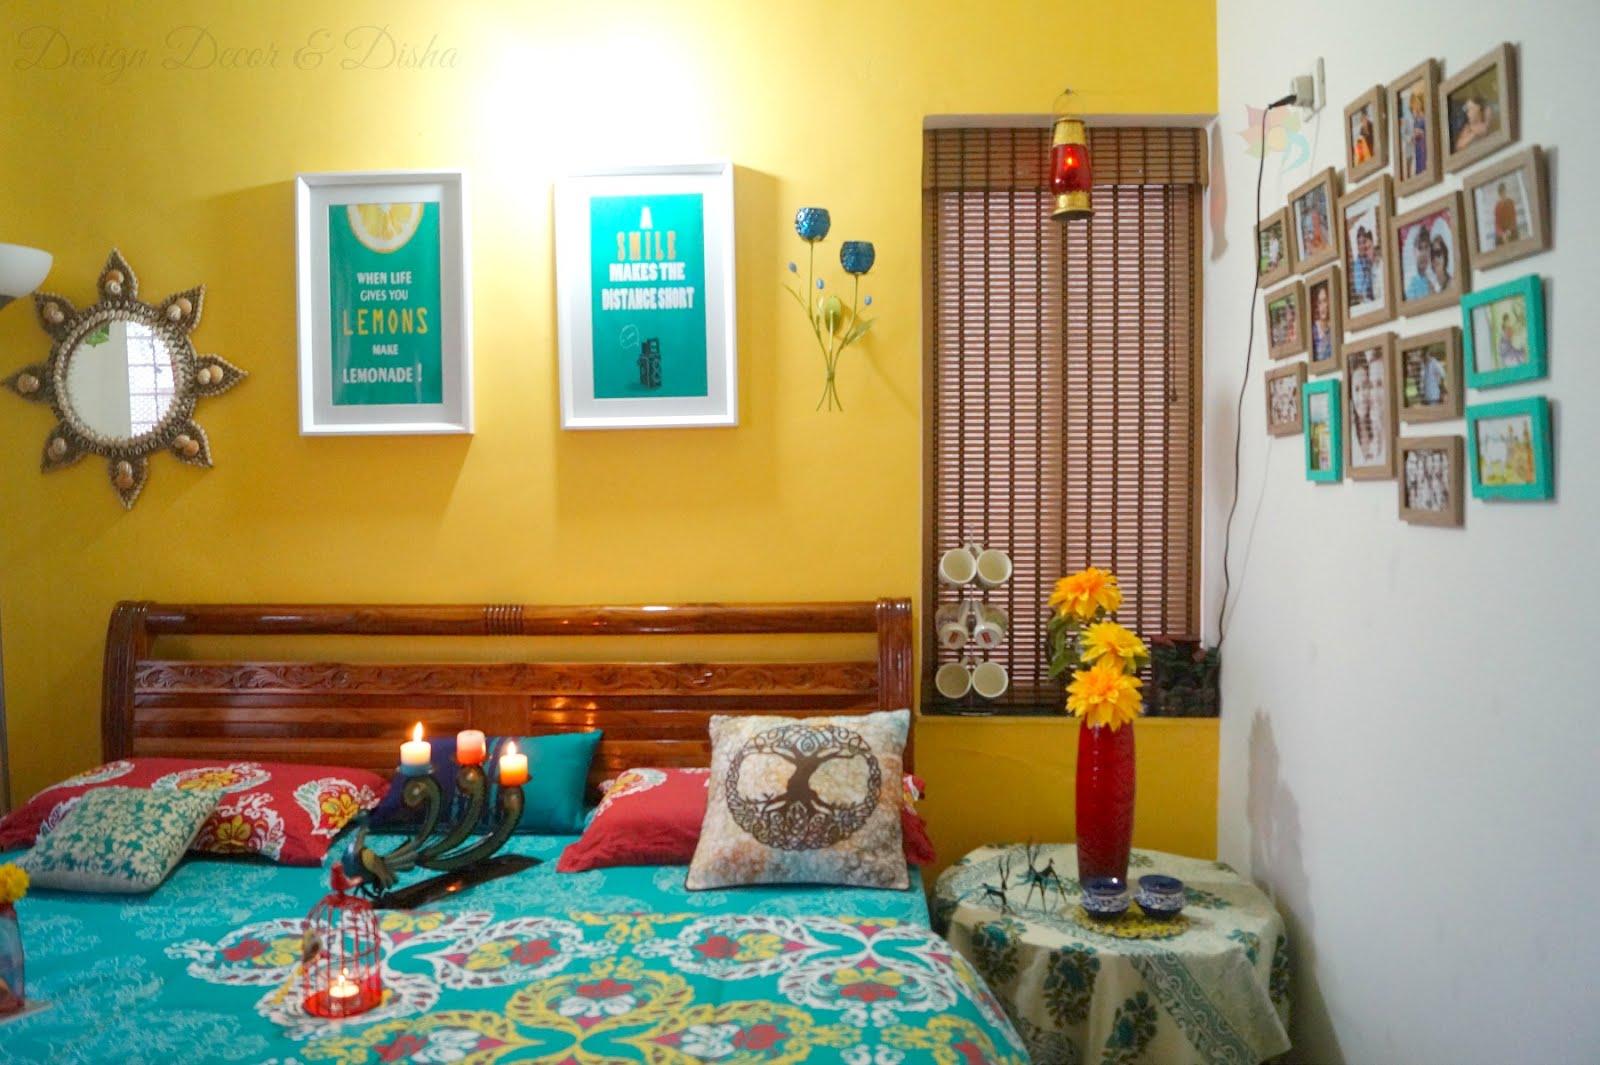 Design Decor & Disha  An Indian Design & Decor Blog: September 9